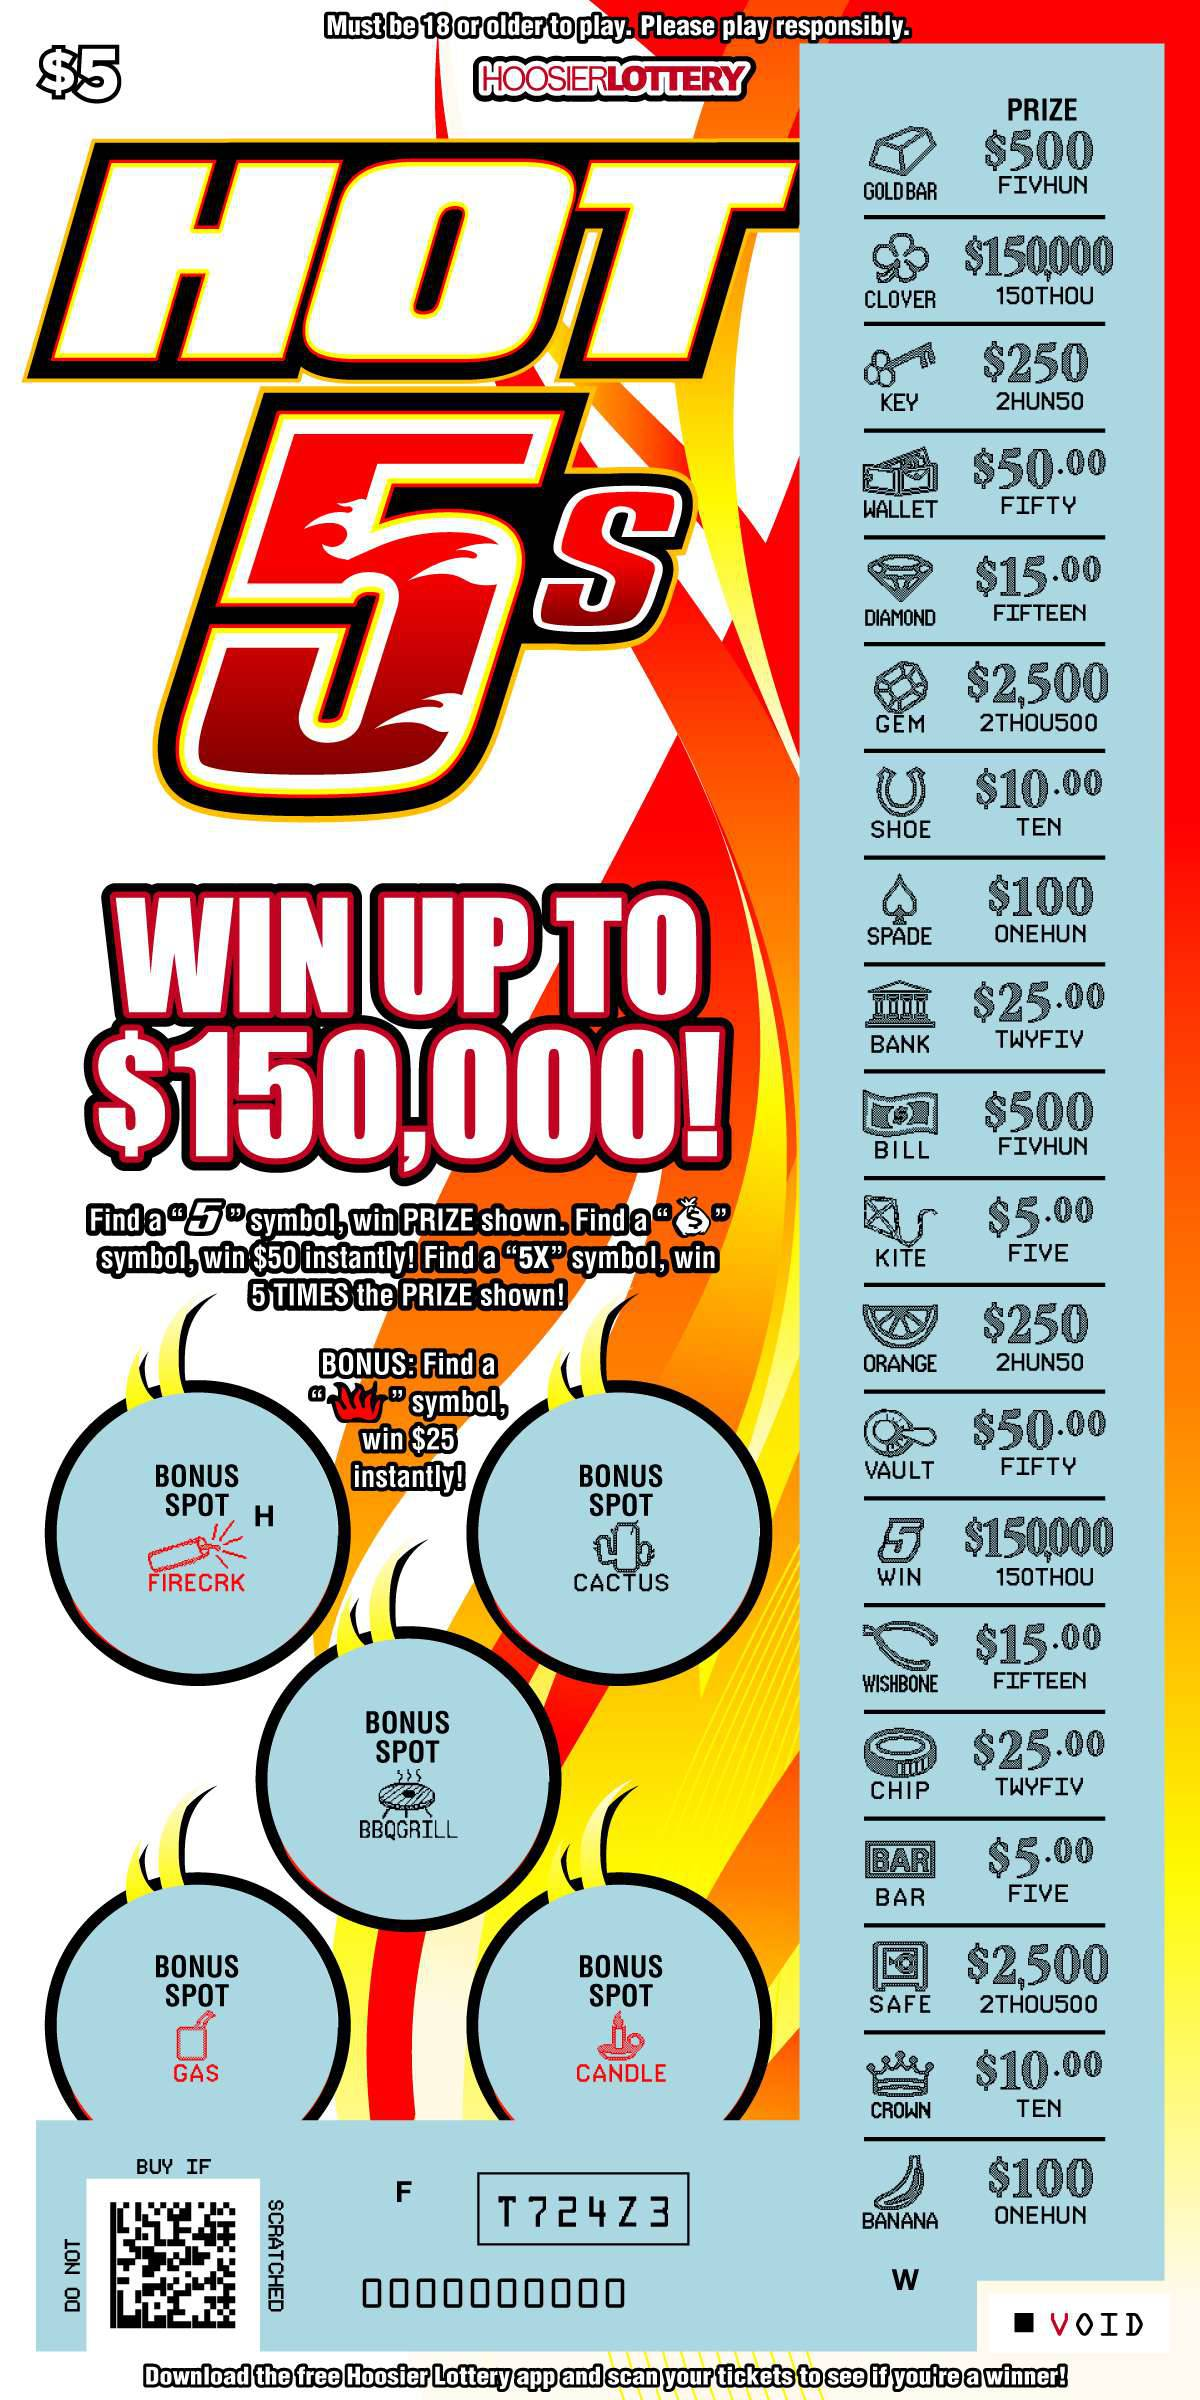 2021 Ohio Christmas Match 3 Scratch Off Scratch Offs Hoosier Lottery Hoosier Lottery